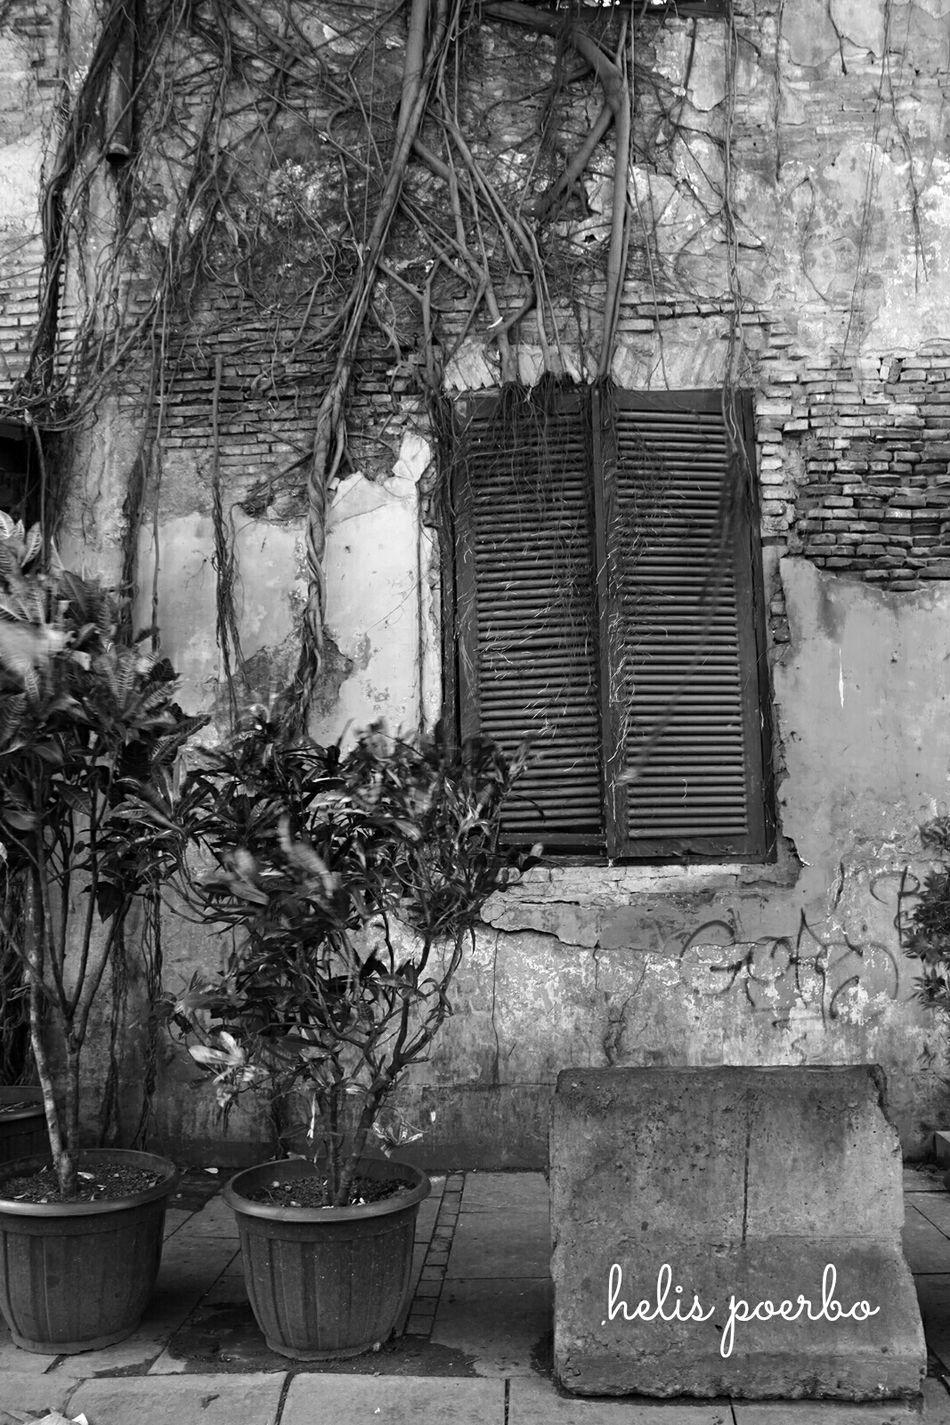 Jumuahmubarak Blessed Day Salamjumuahalmubarakah Streetphotography Streetphoto_bw Bnw_friday_eyeemchallenge Bw_friday_challenge